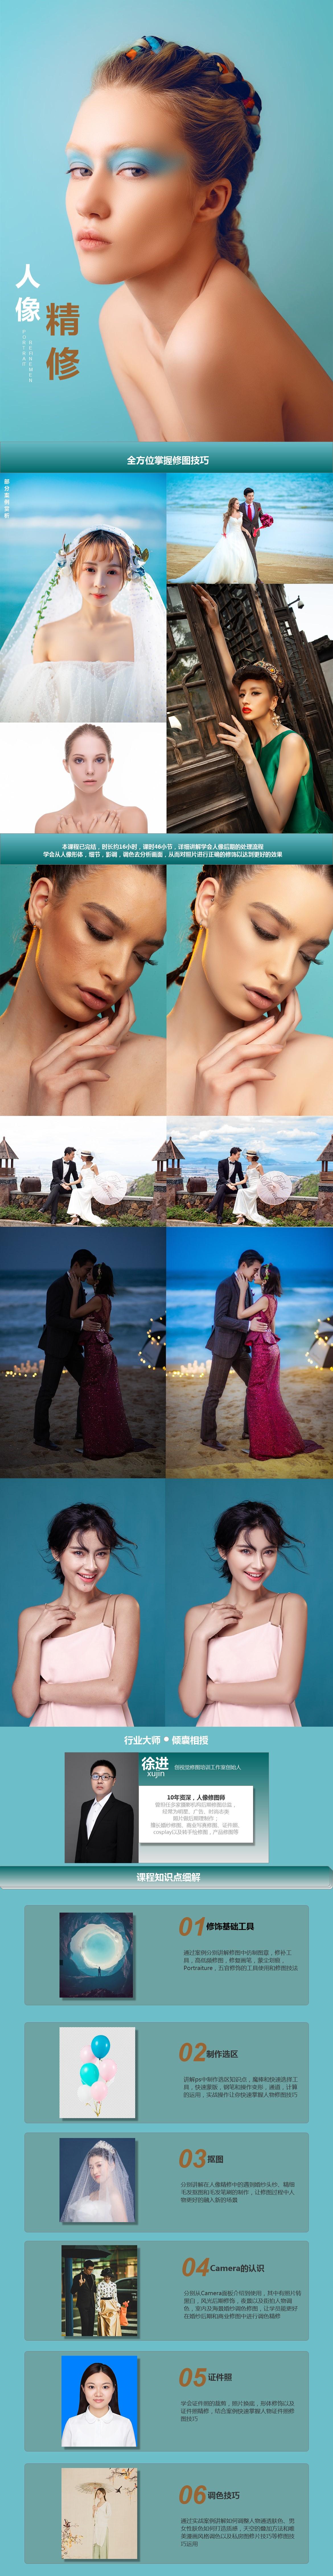 PS人像精修摄影后期婚纱商业修图实战教程